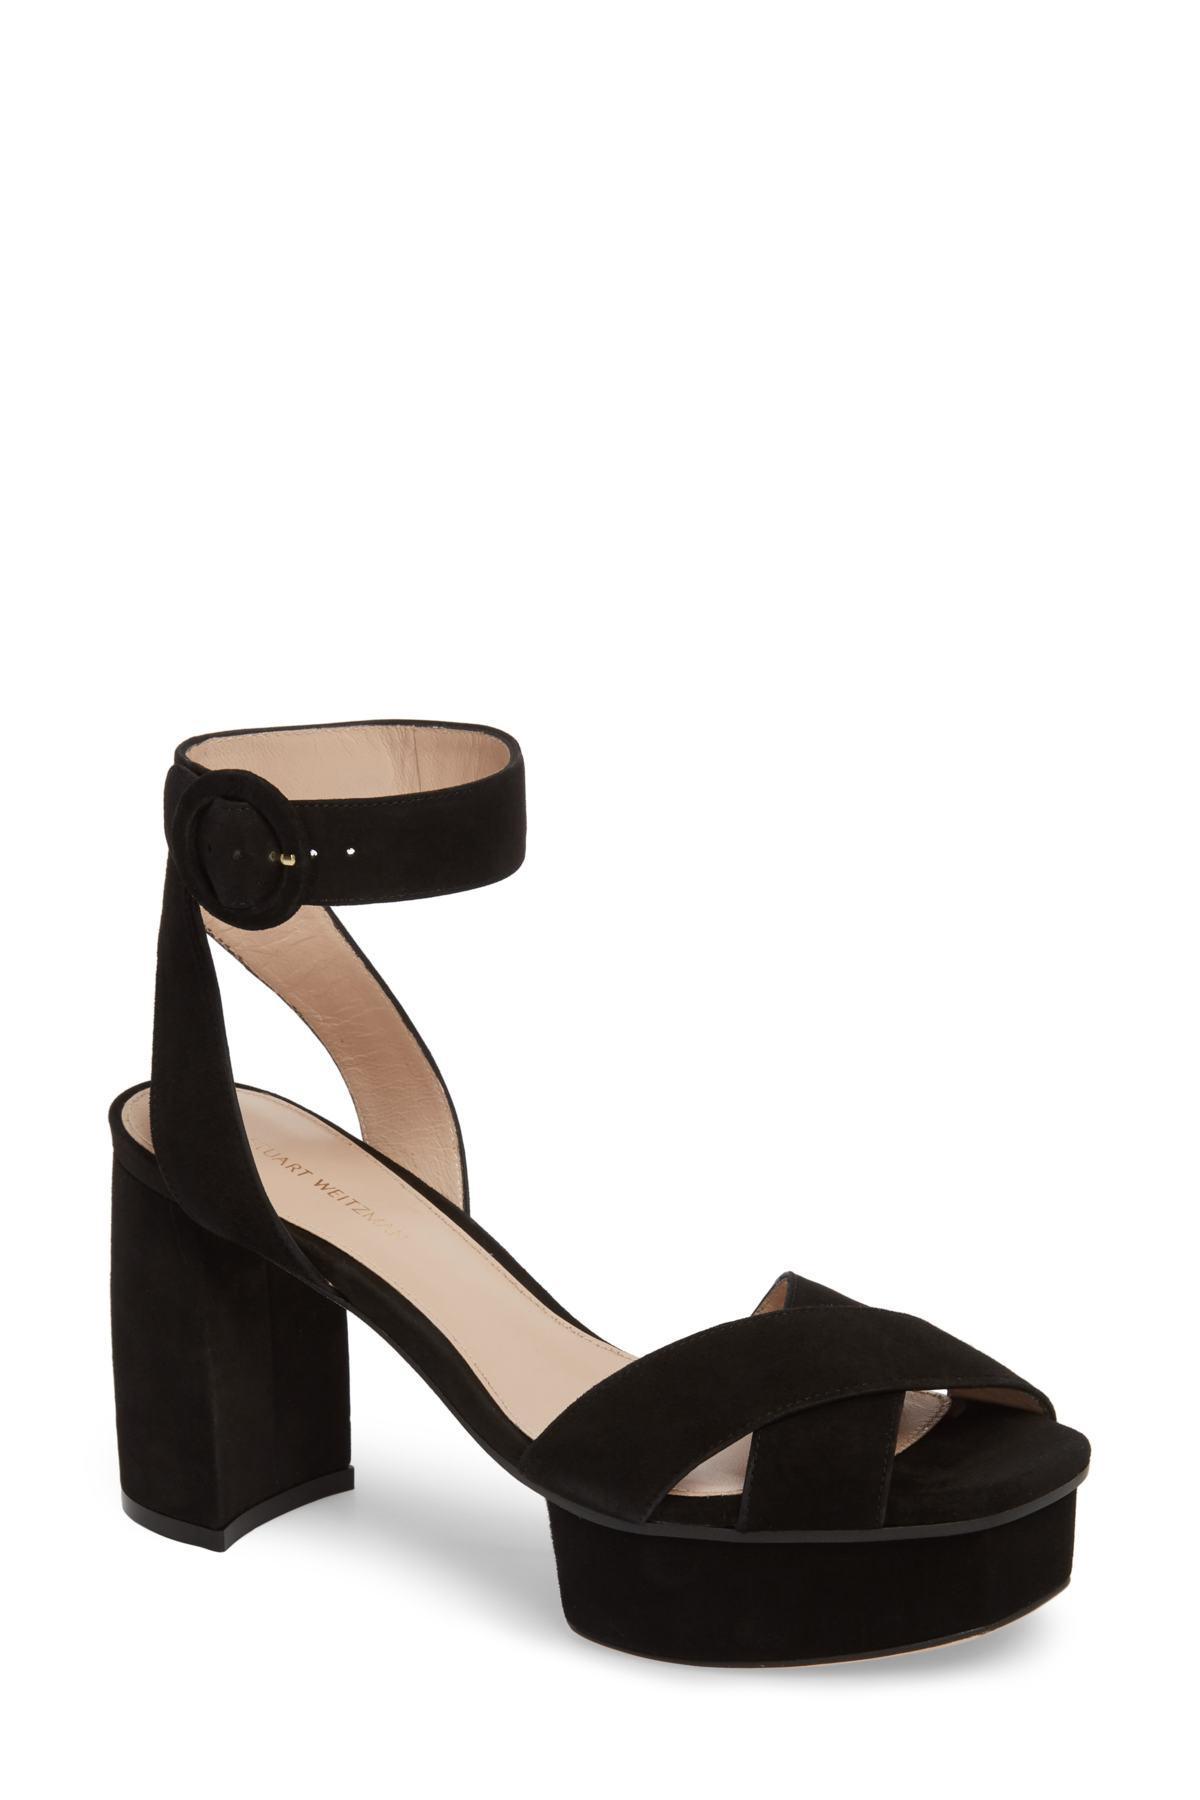 619daa0bb32 Lyst - Stuart Weitzman Shoes For Women in Black